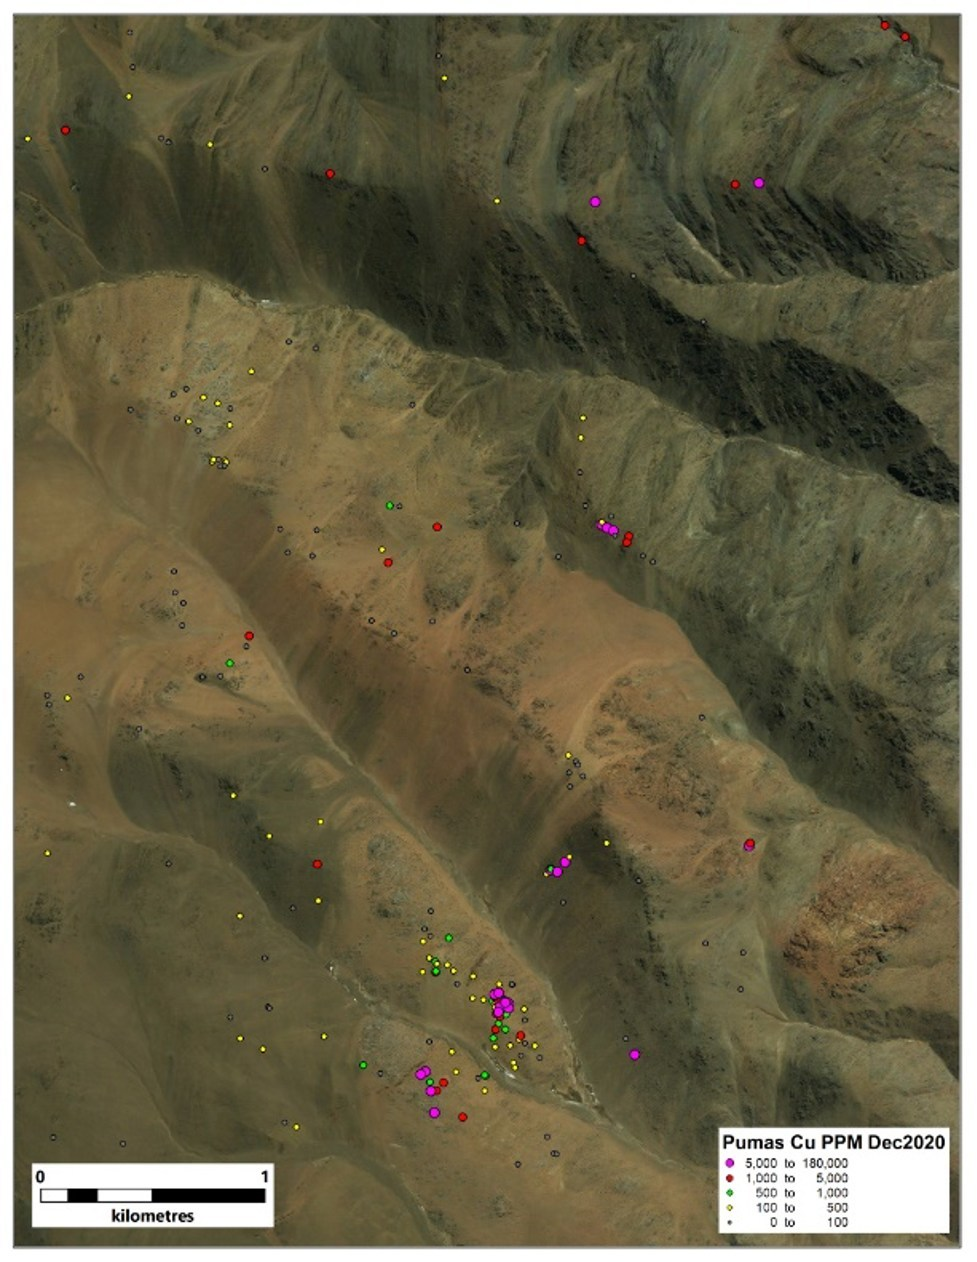 Figure 5. Cu values at Los Pumas (CNW Group/Sable Resources Ltd.)